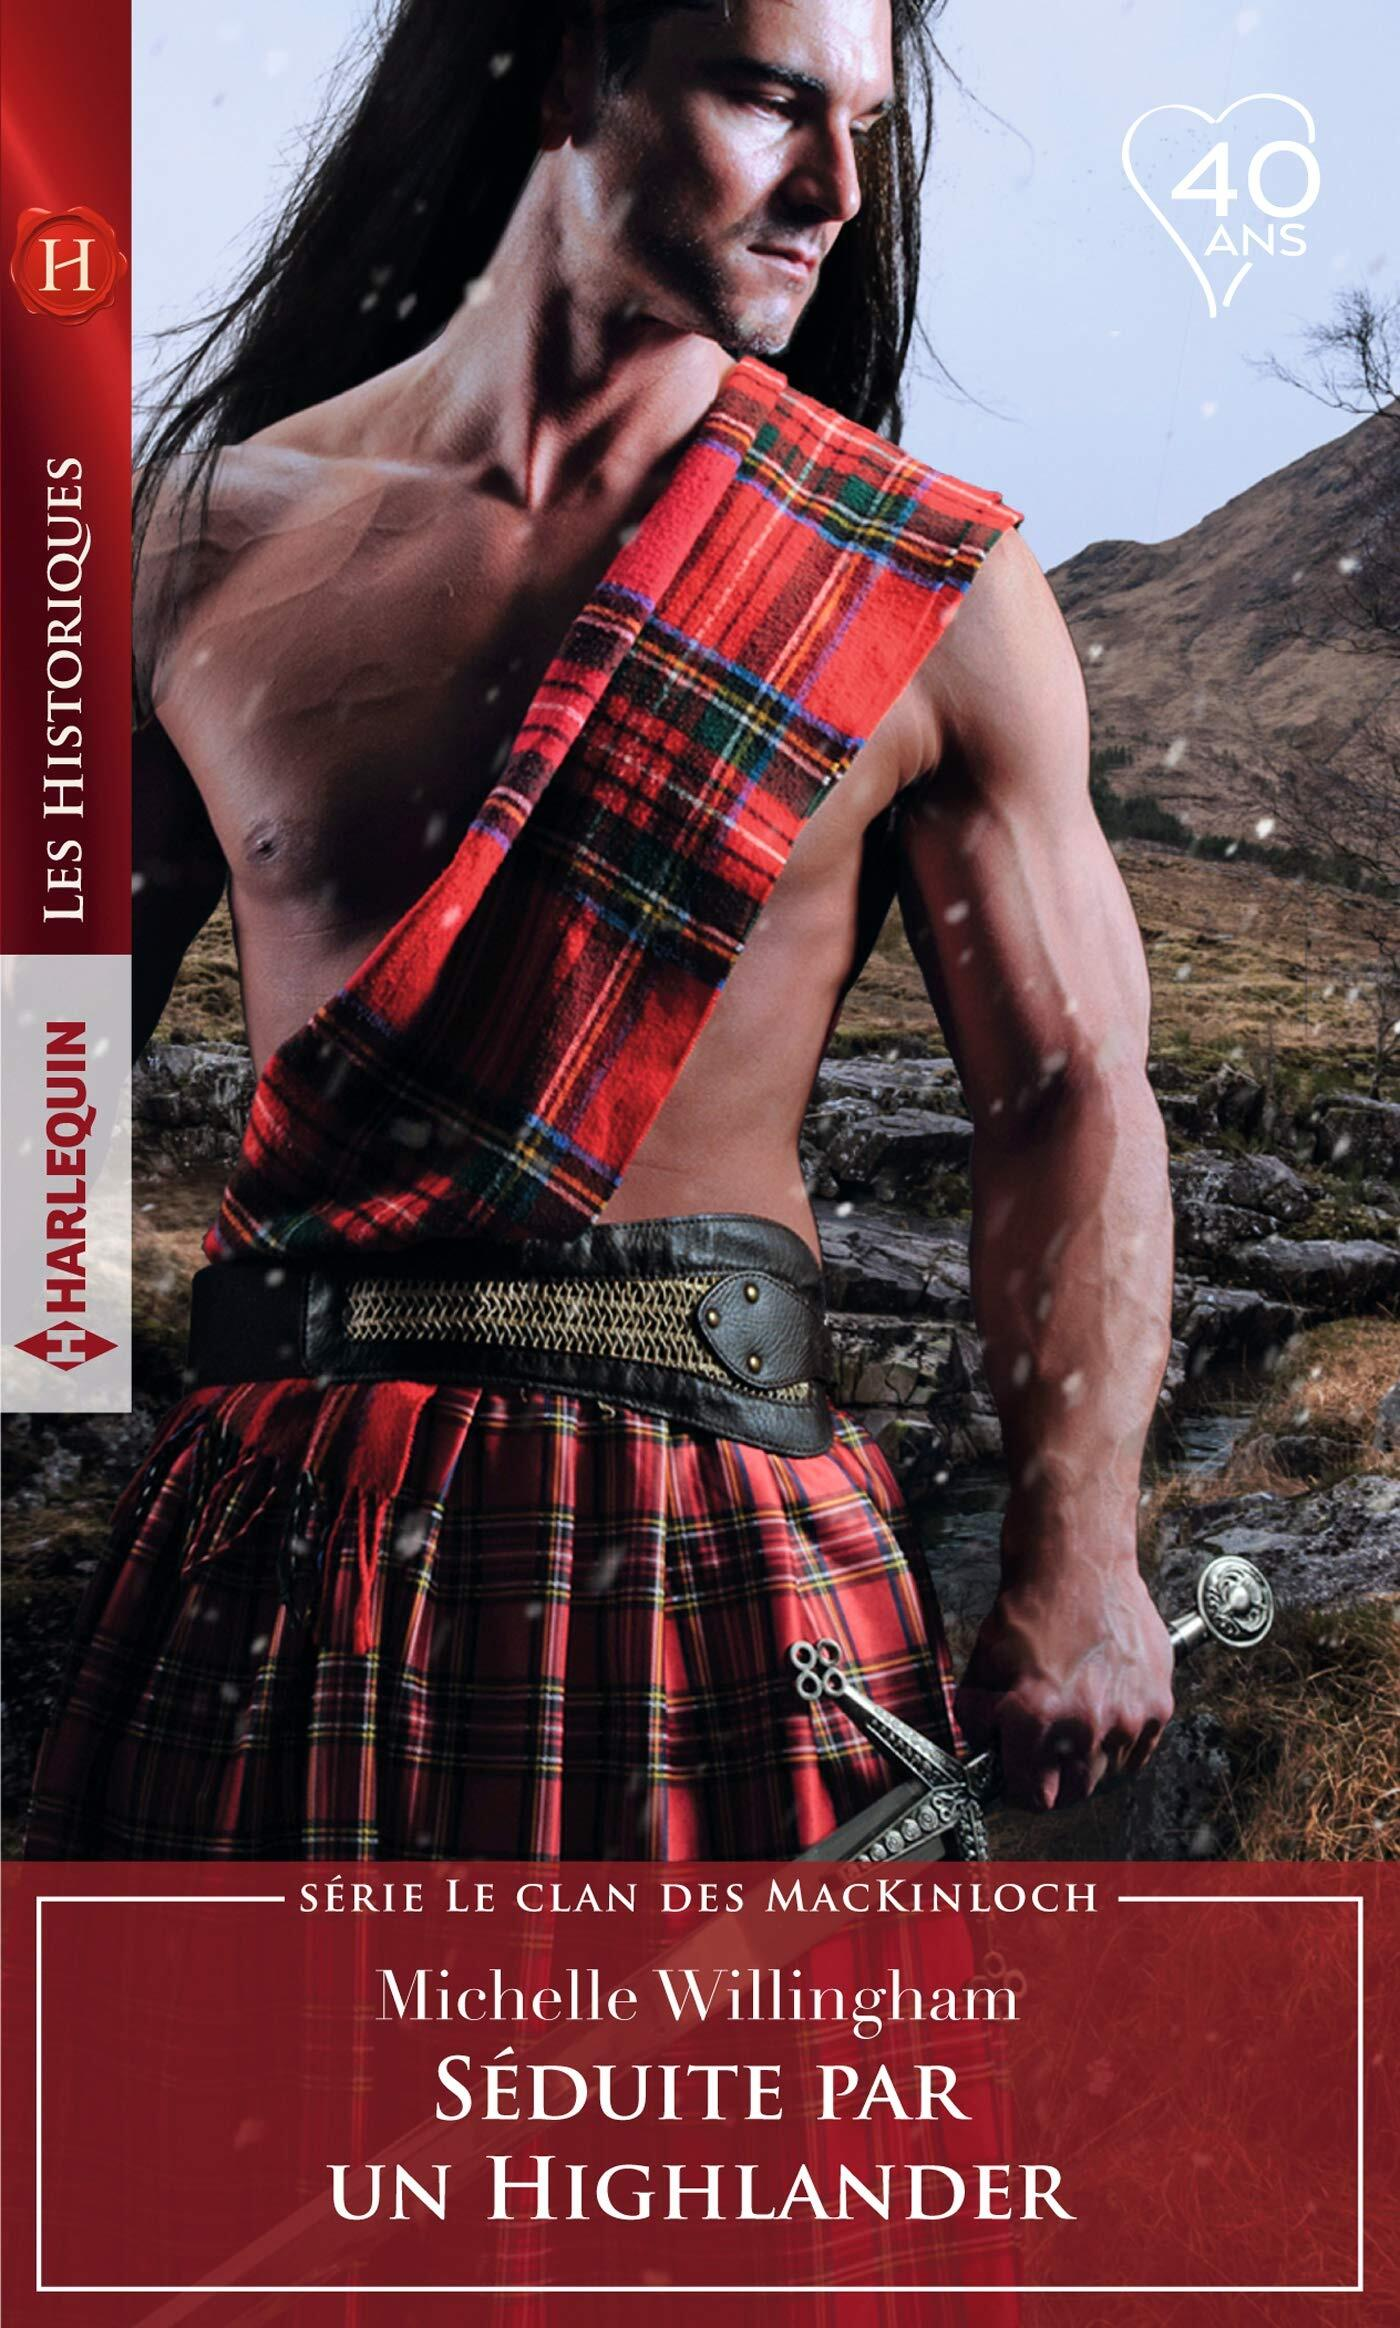 cdn1.booknode.com/book_cover/1133/full/le-clan-des-mackinloch-tome-2-seduite-par-un-highlander-1132500.jpg